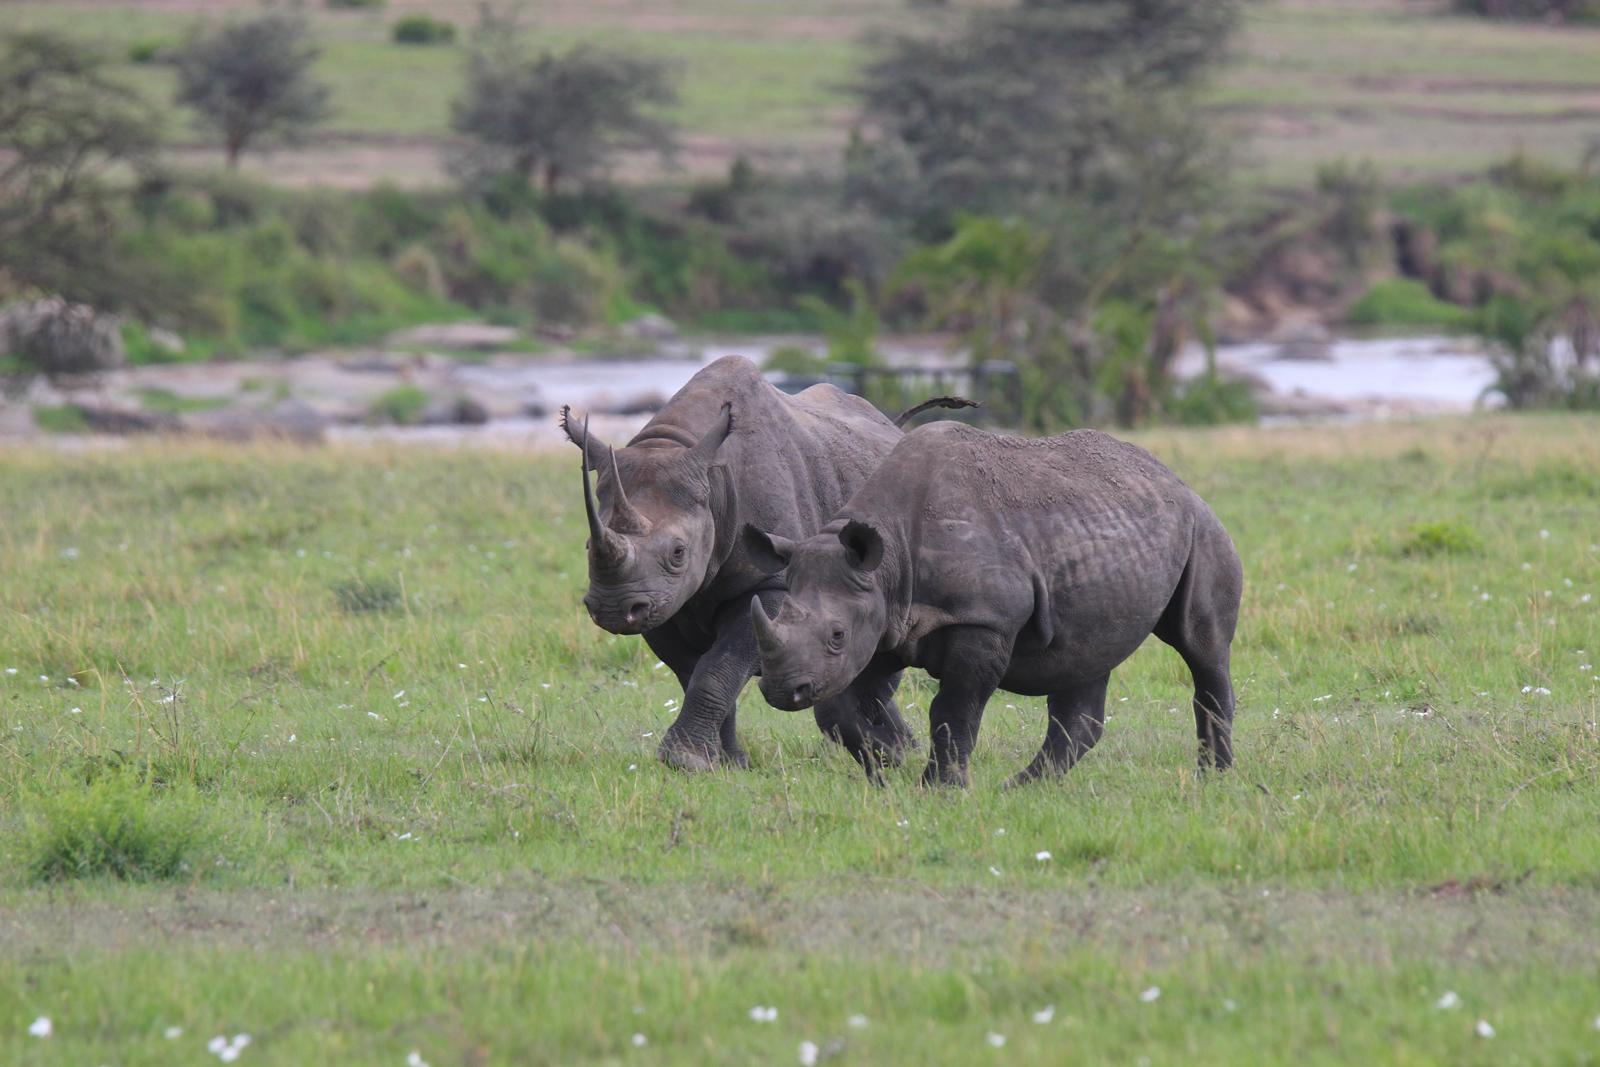 Black rhino mother and calf in the Serengeti